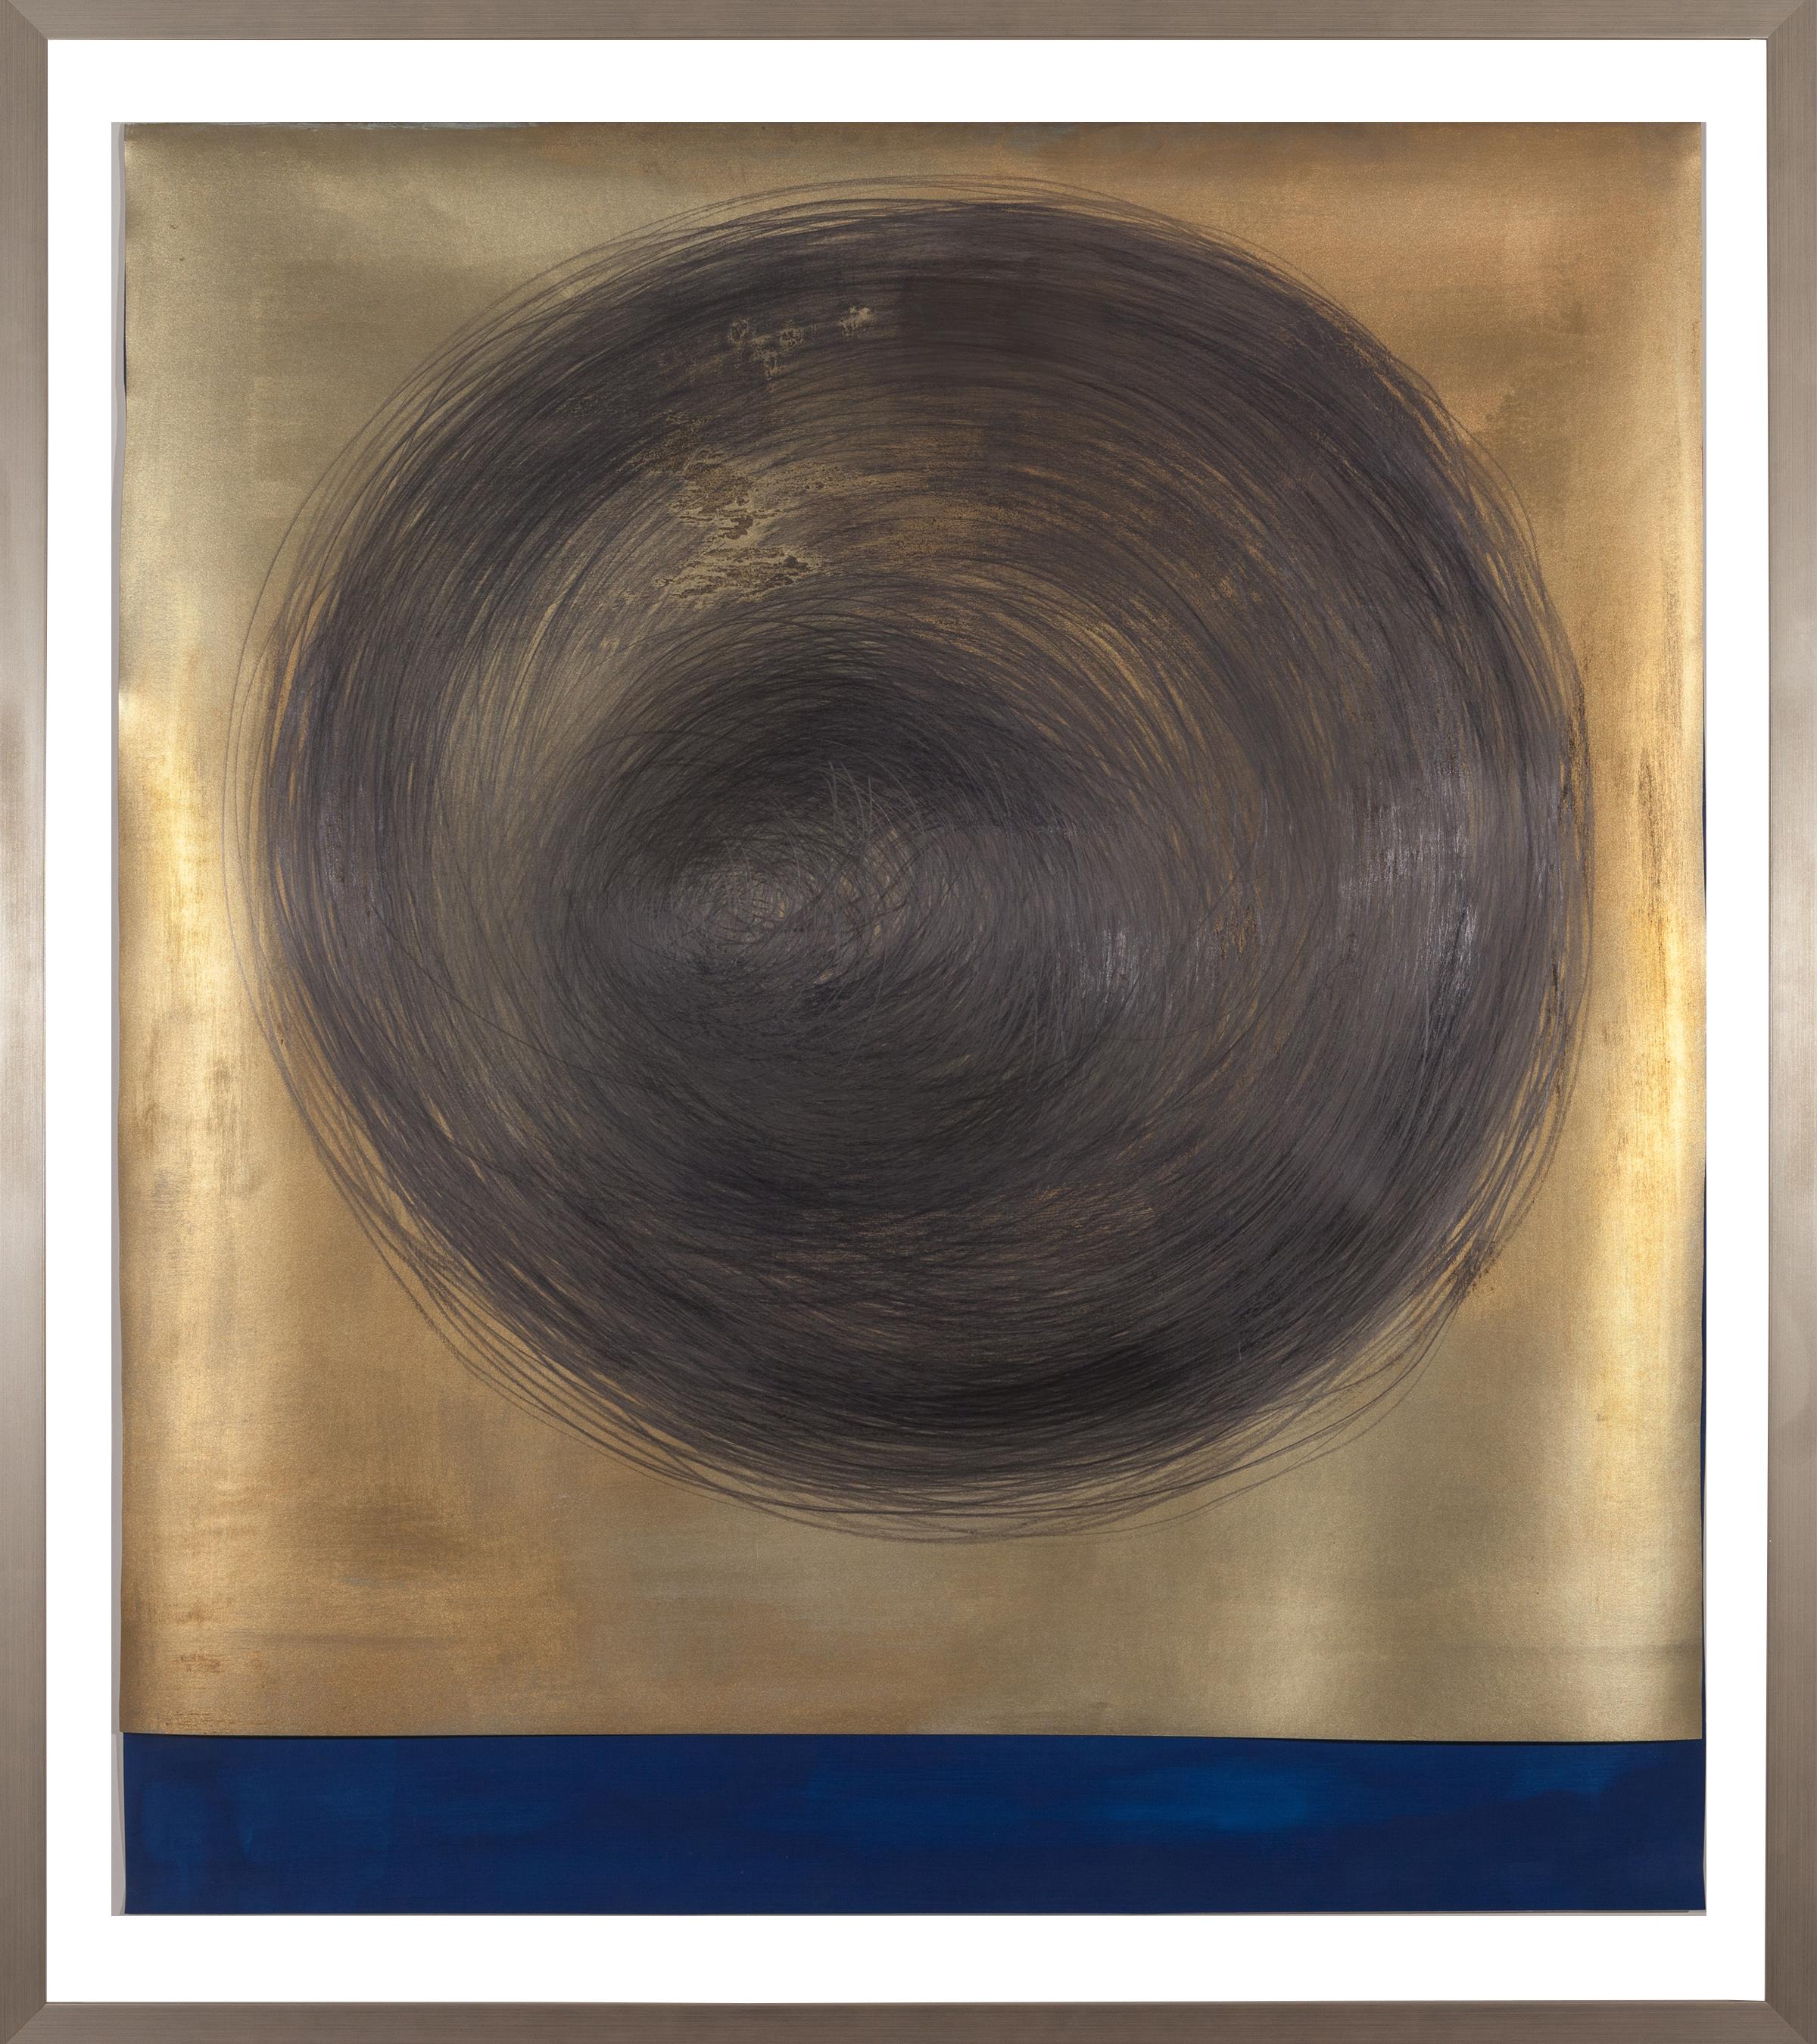 SOLD - Circle Drawing Gold/Navy/Blue (2017)